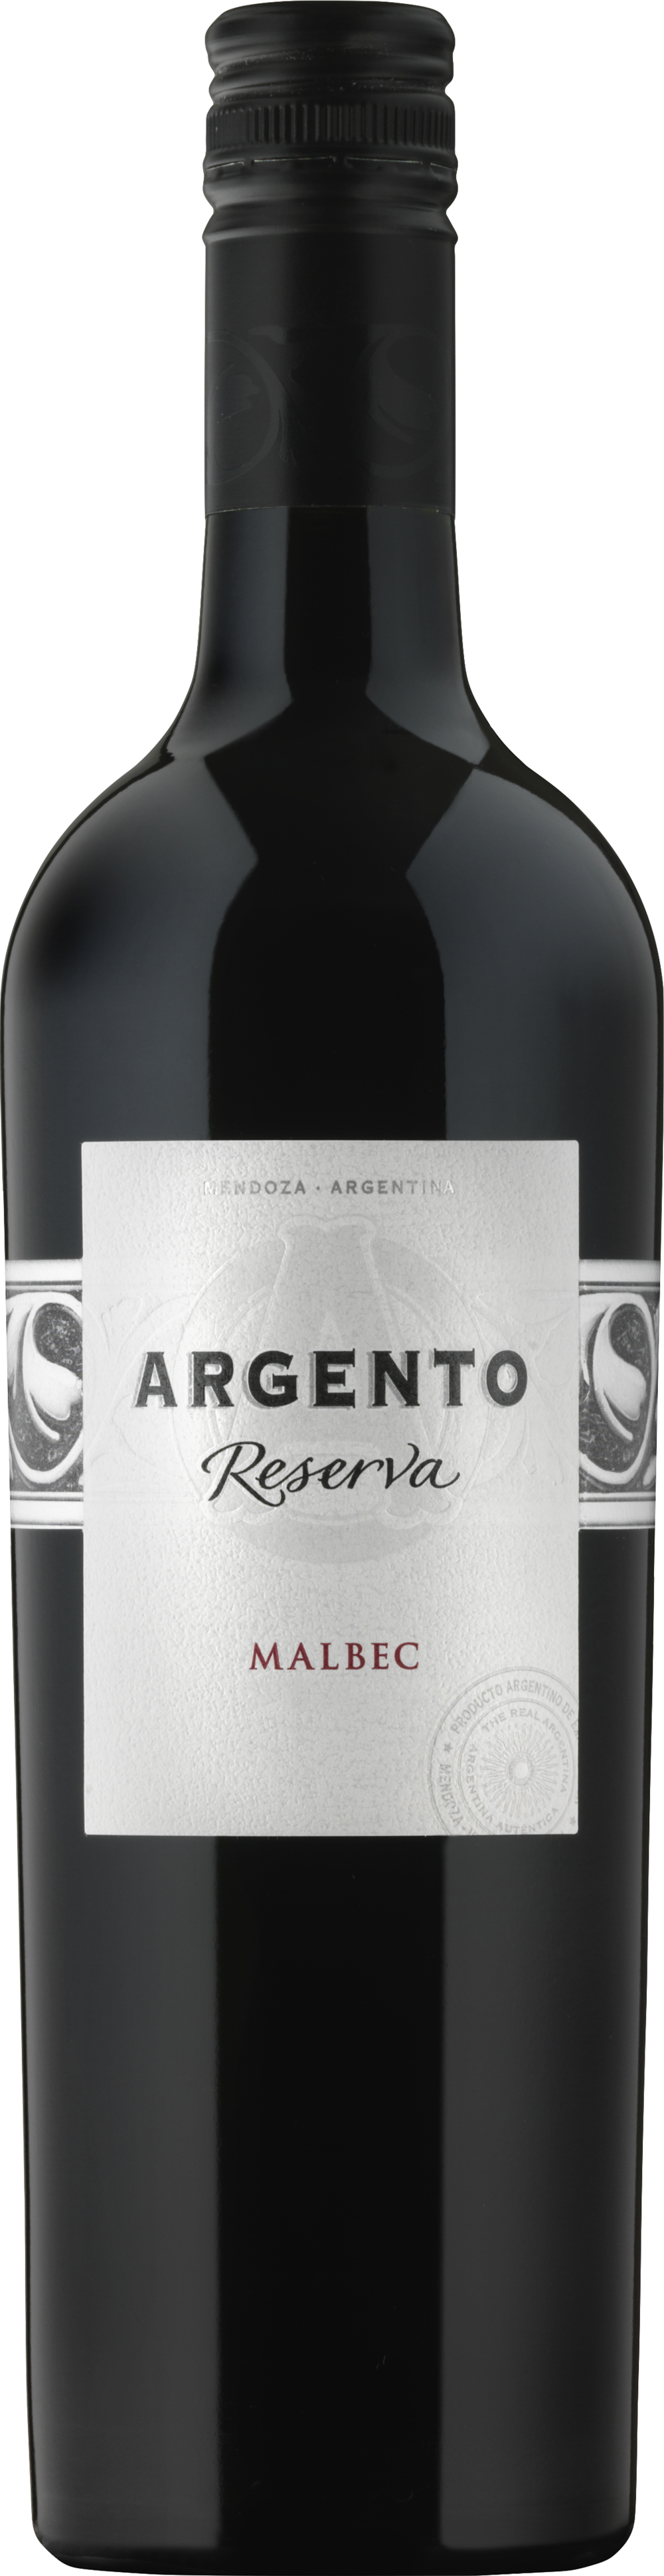 2 Argento-Reserva-Malbec-SC1.png